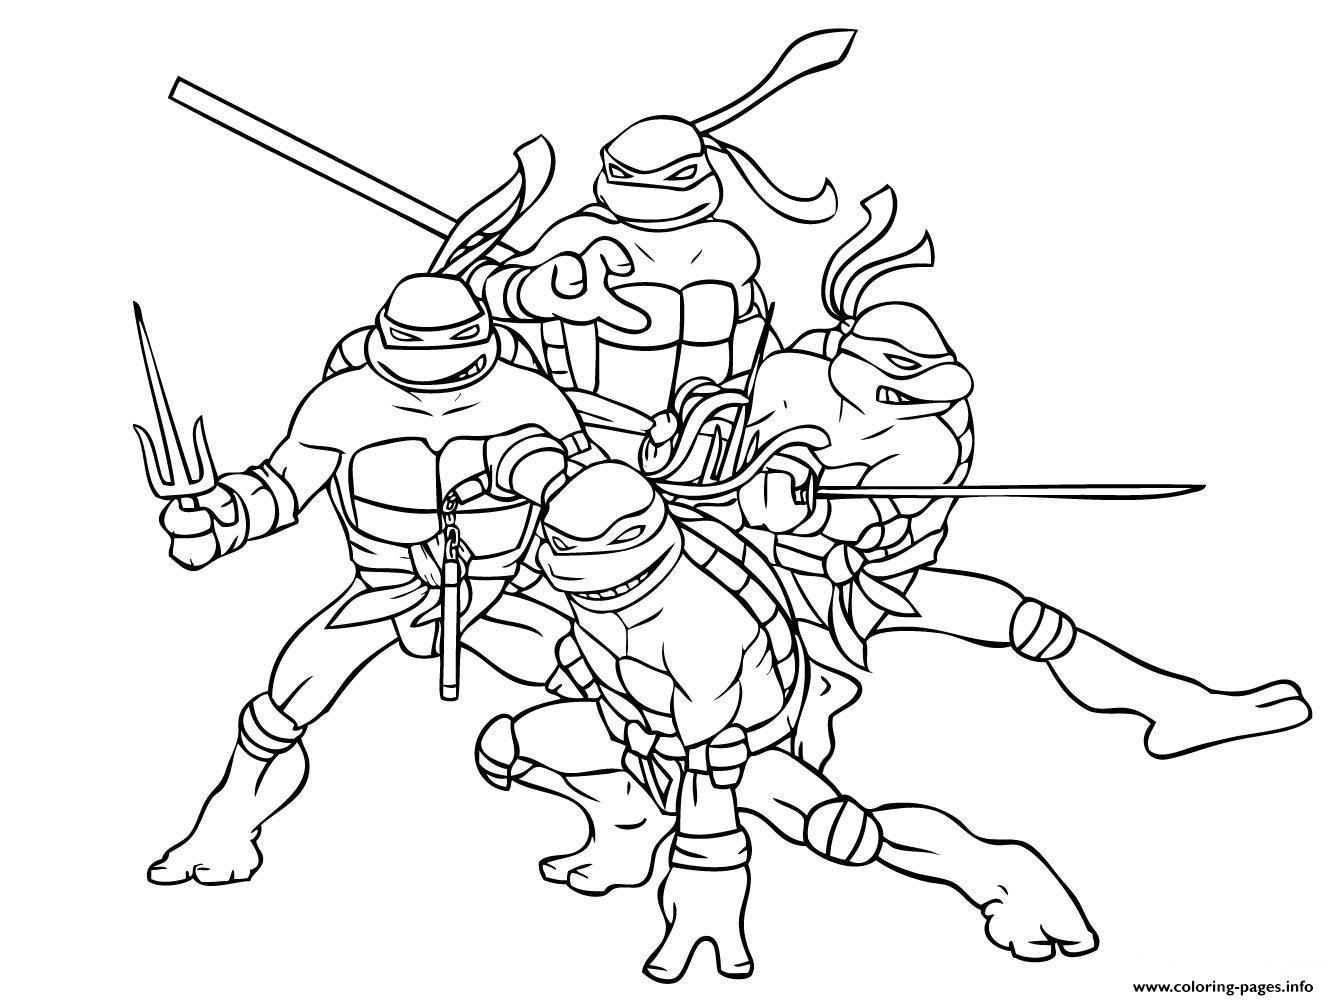 Superhero Ninja Turtle Freef8a0 Coloring Pages Printable